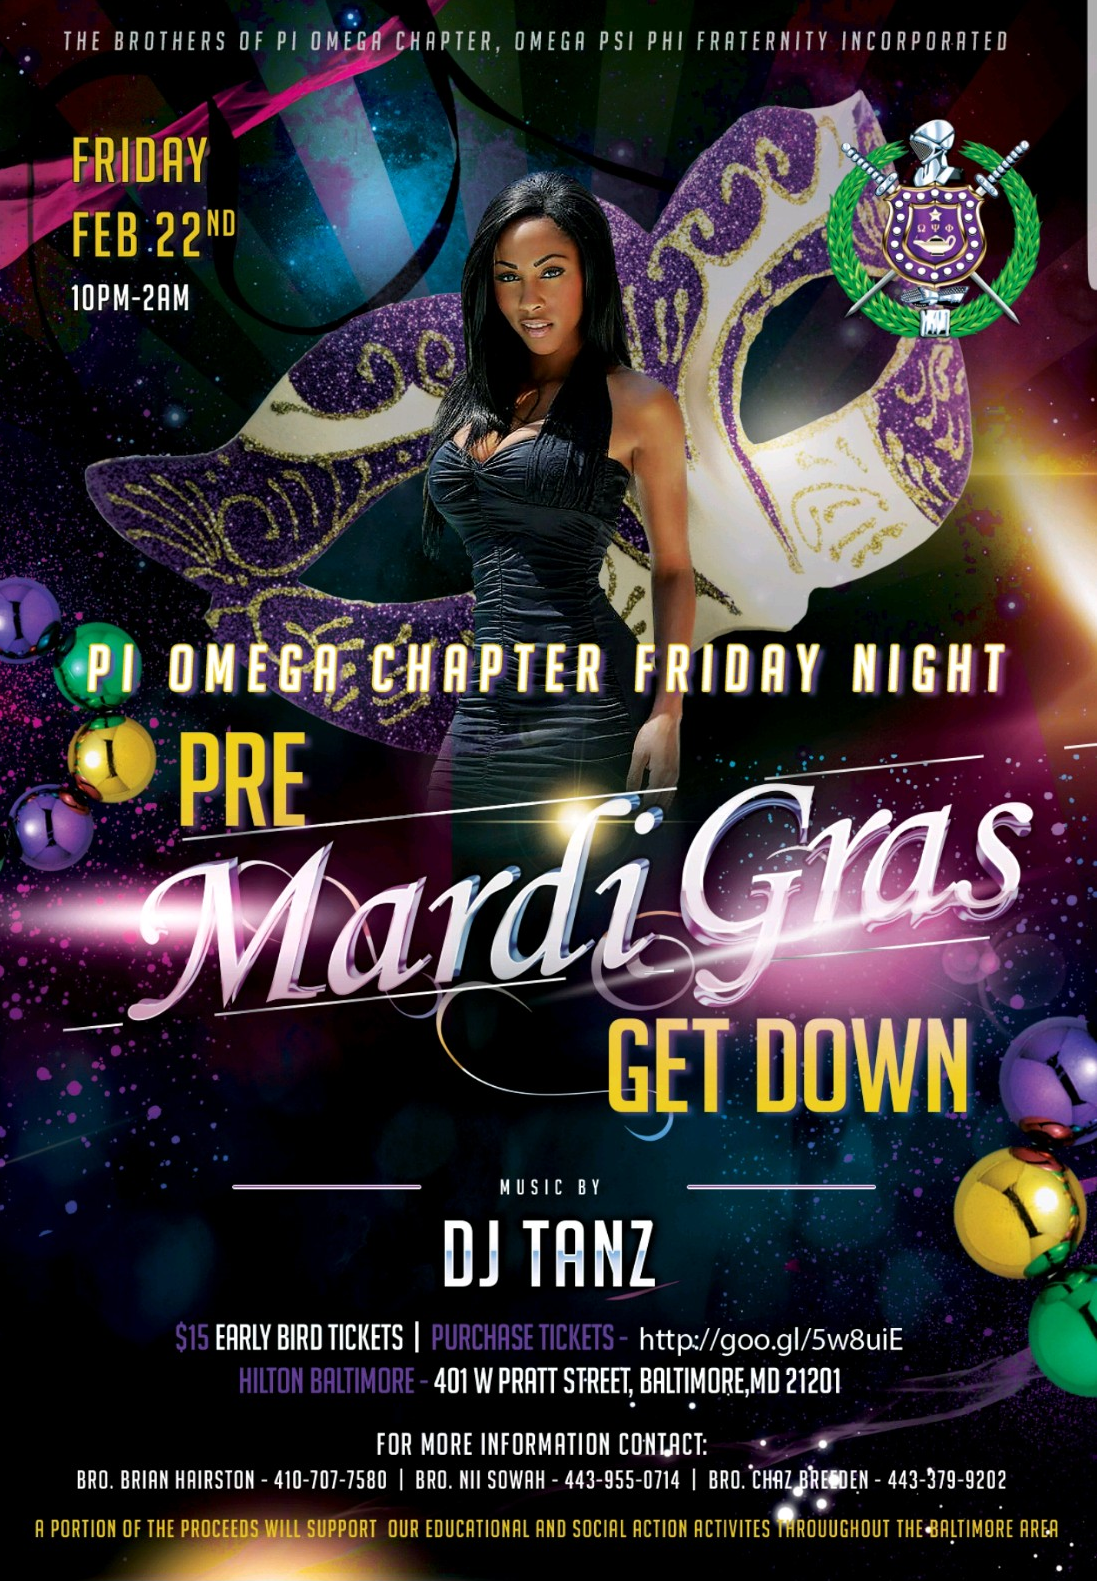 Pi Omega Friday Night Pre-Mardi Gras Party 00002